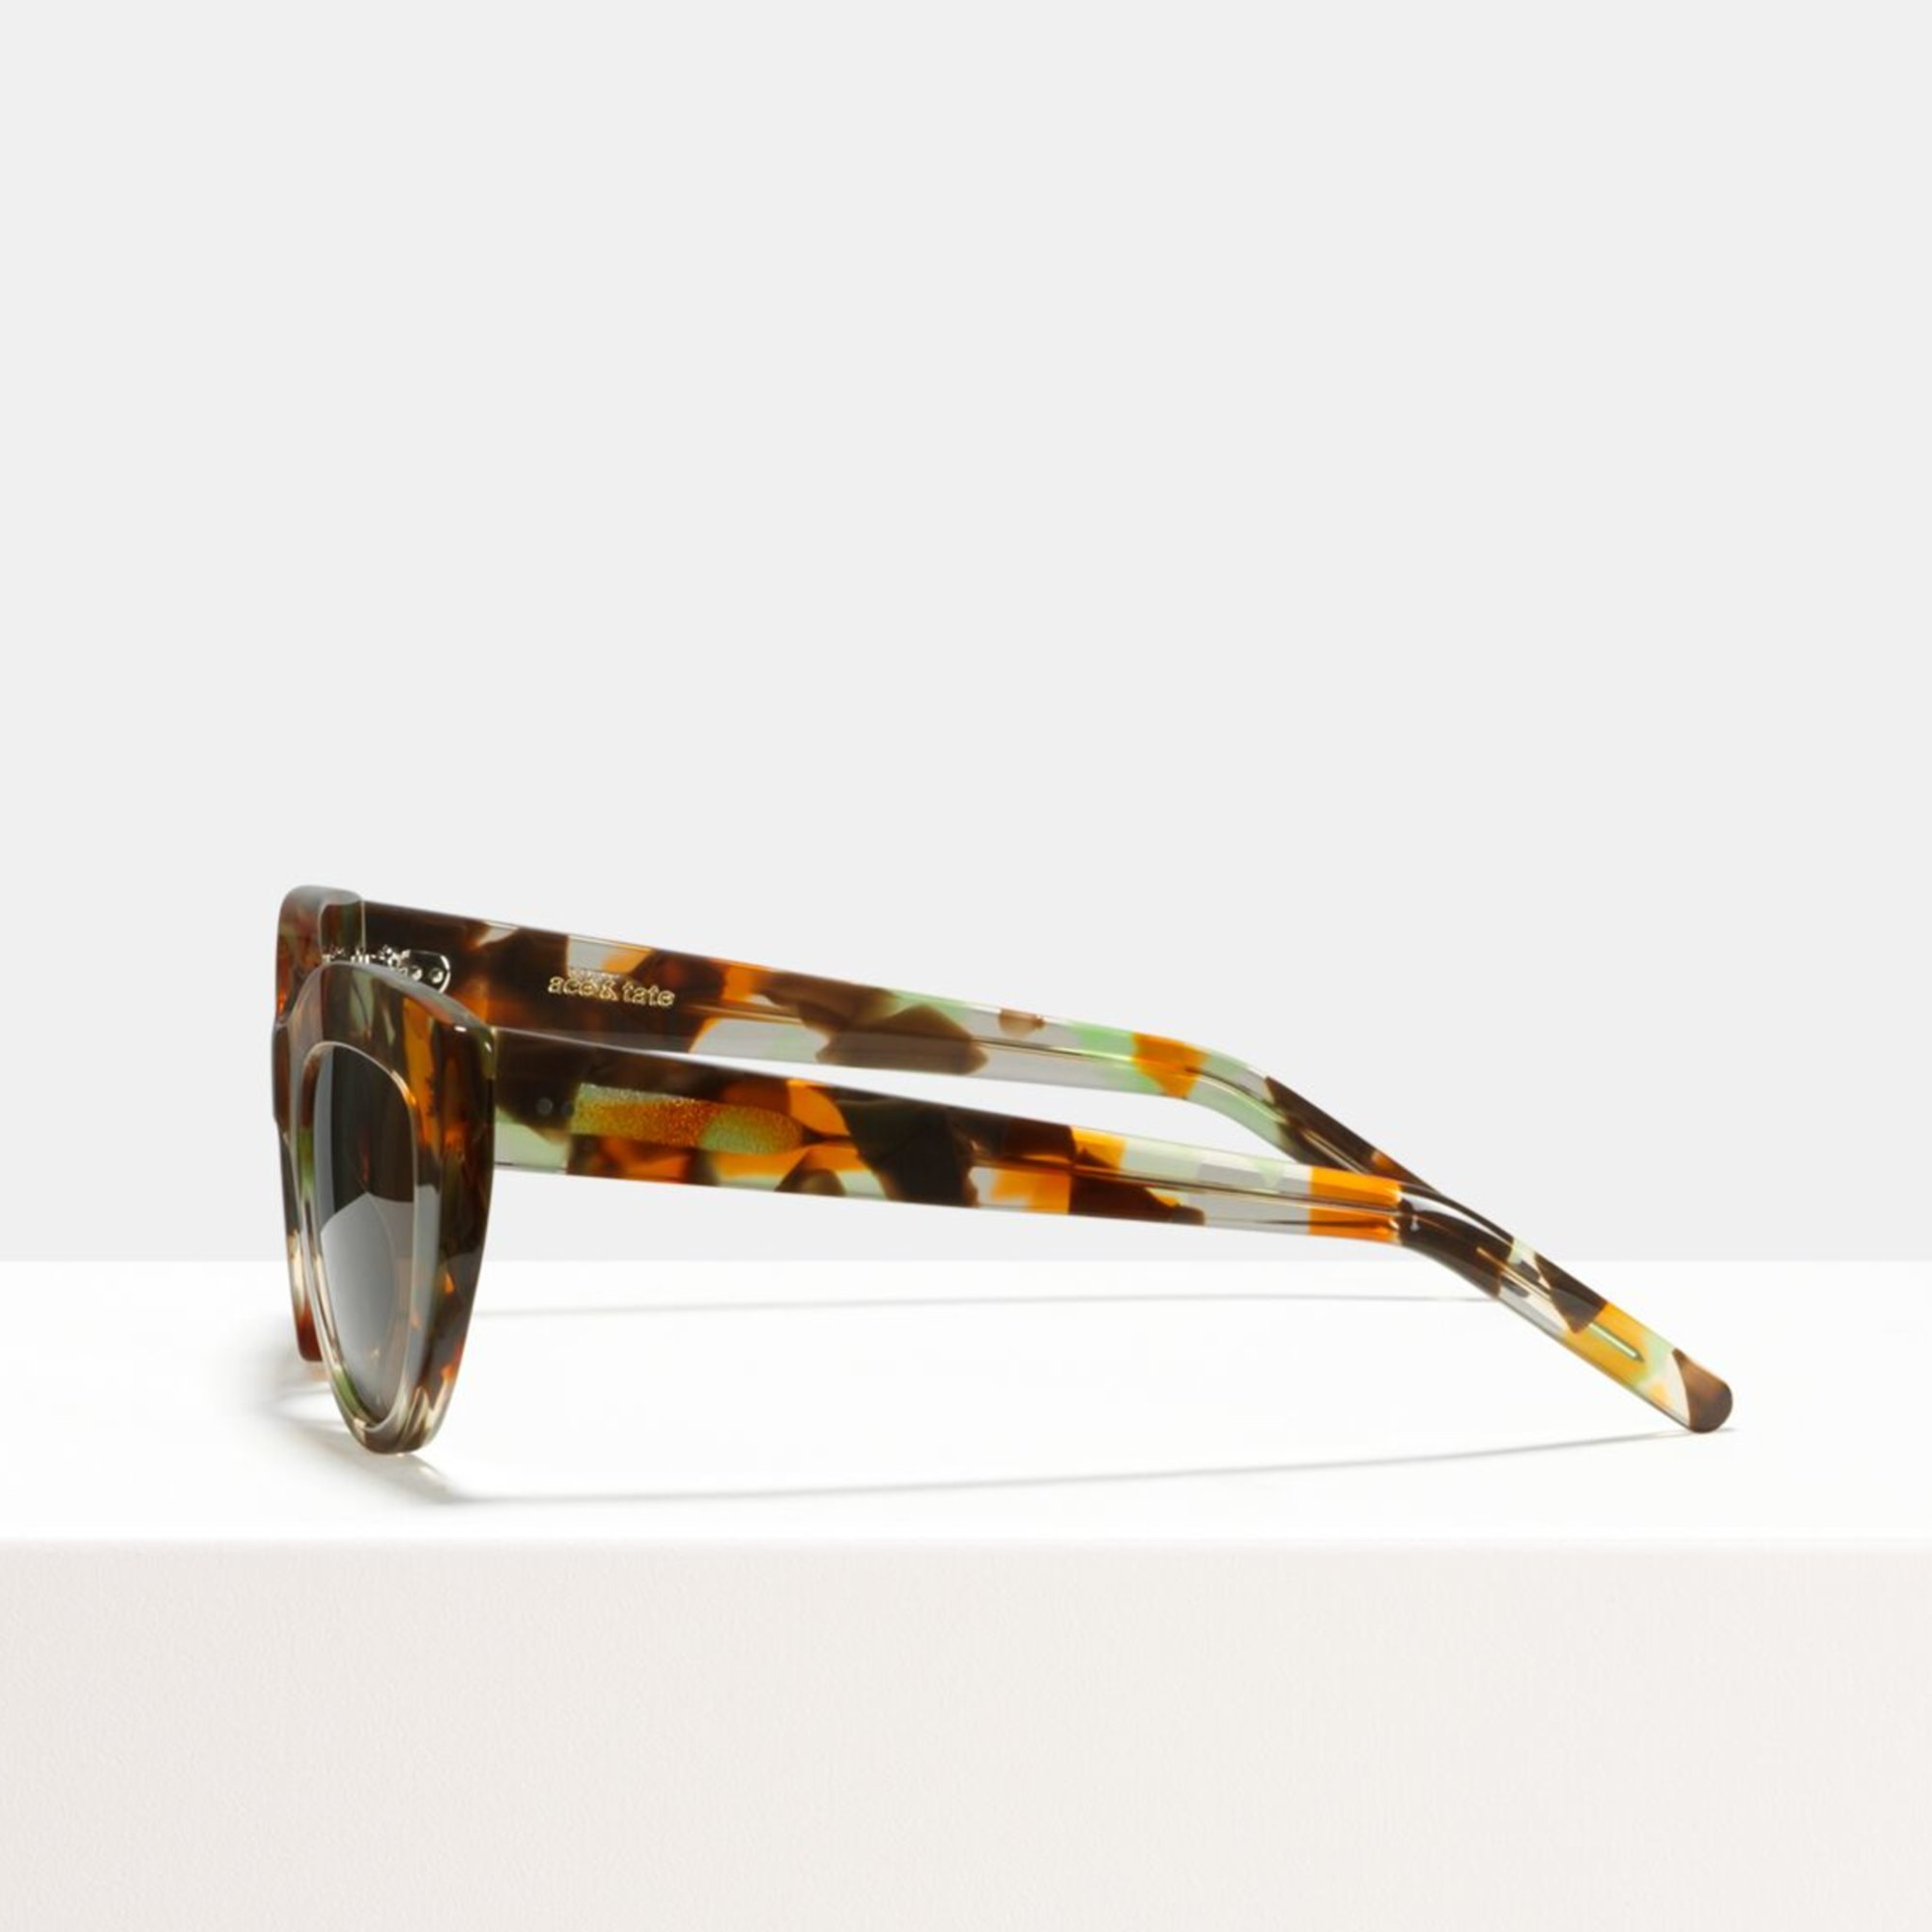 Ace & Tate Sunglasses |  acetate in Brown, Green, Orange